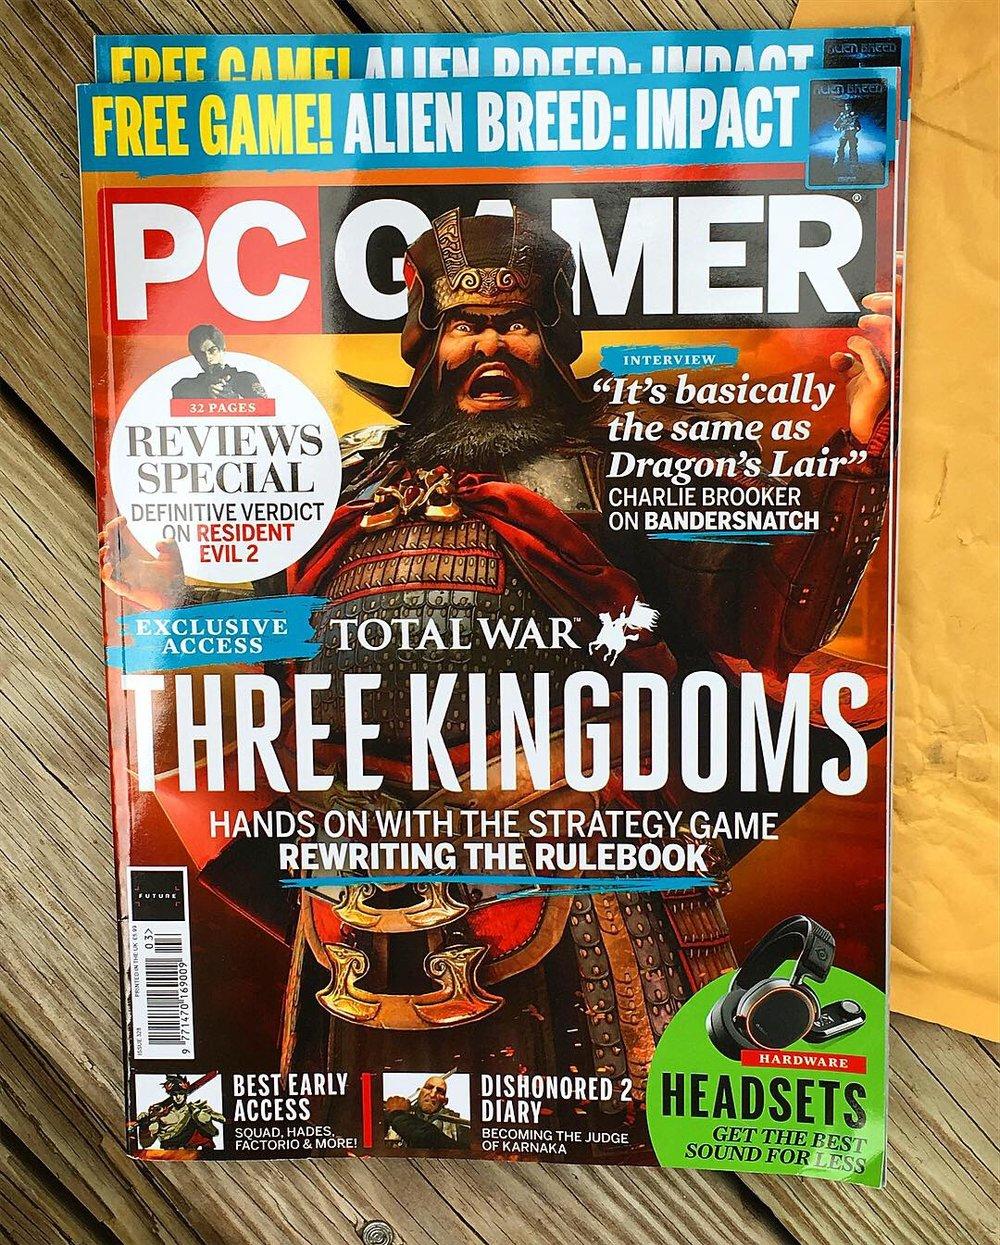 PC Gamer - 2019 March UK 2.JPG